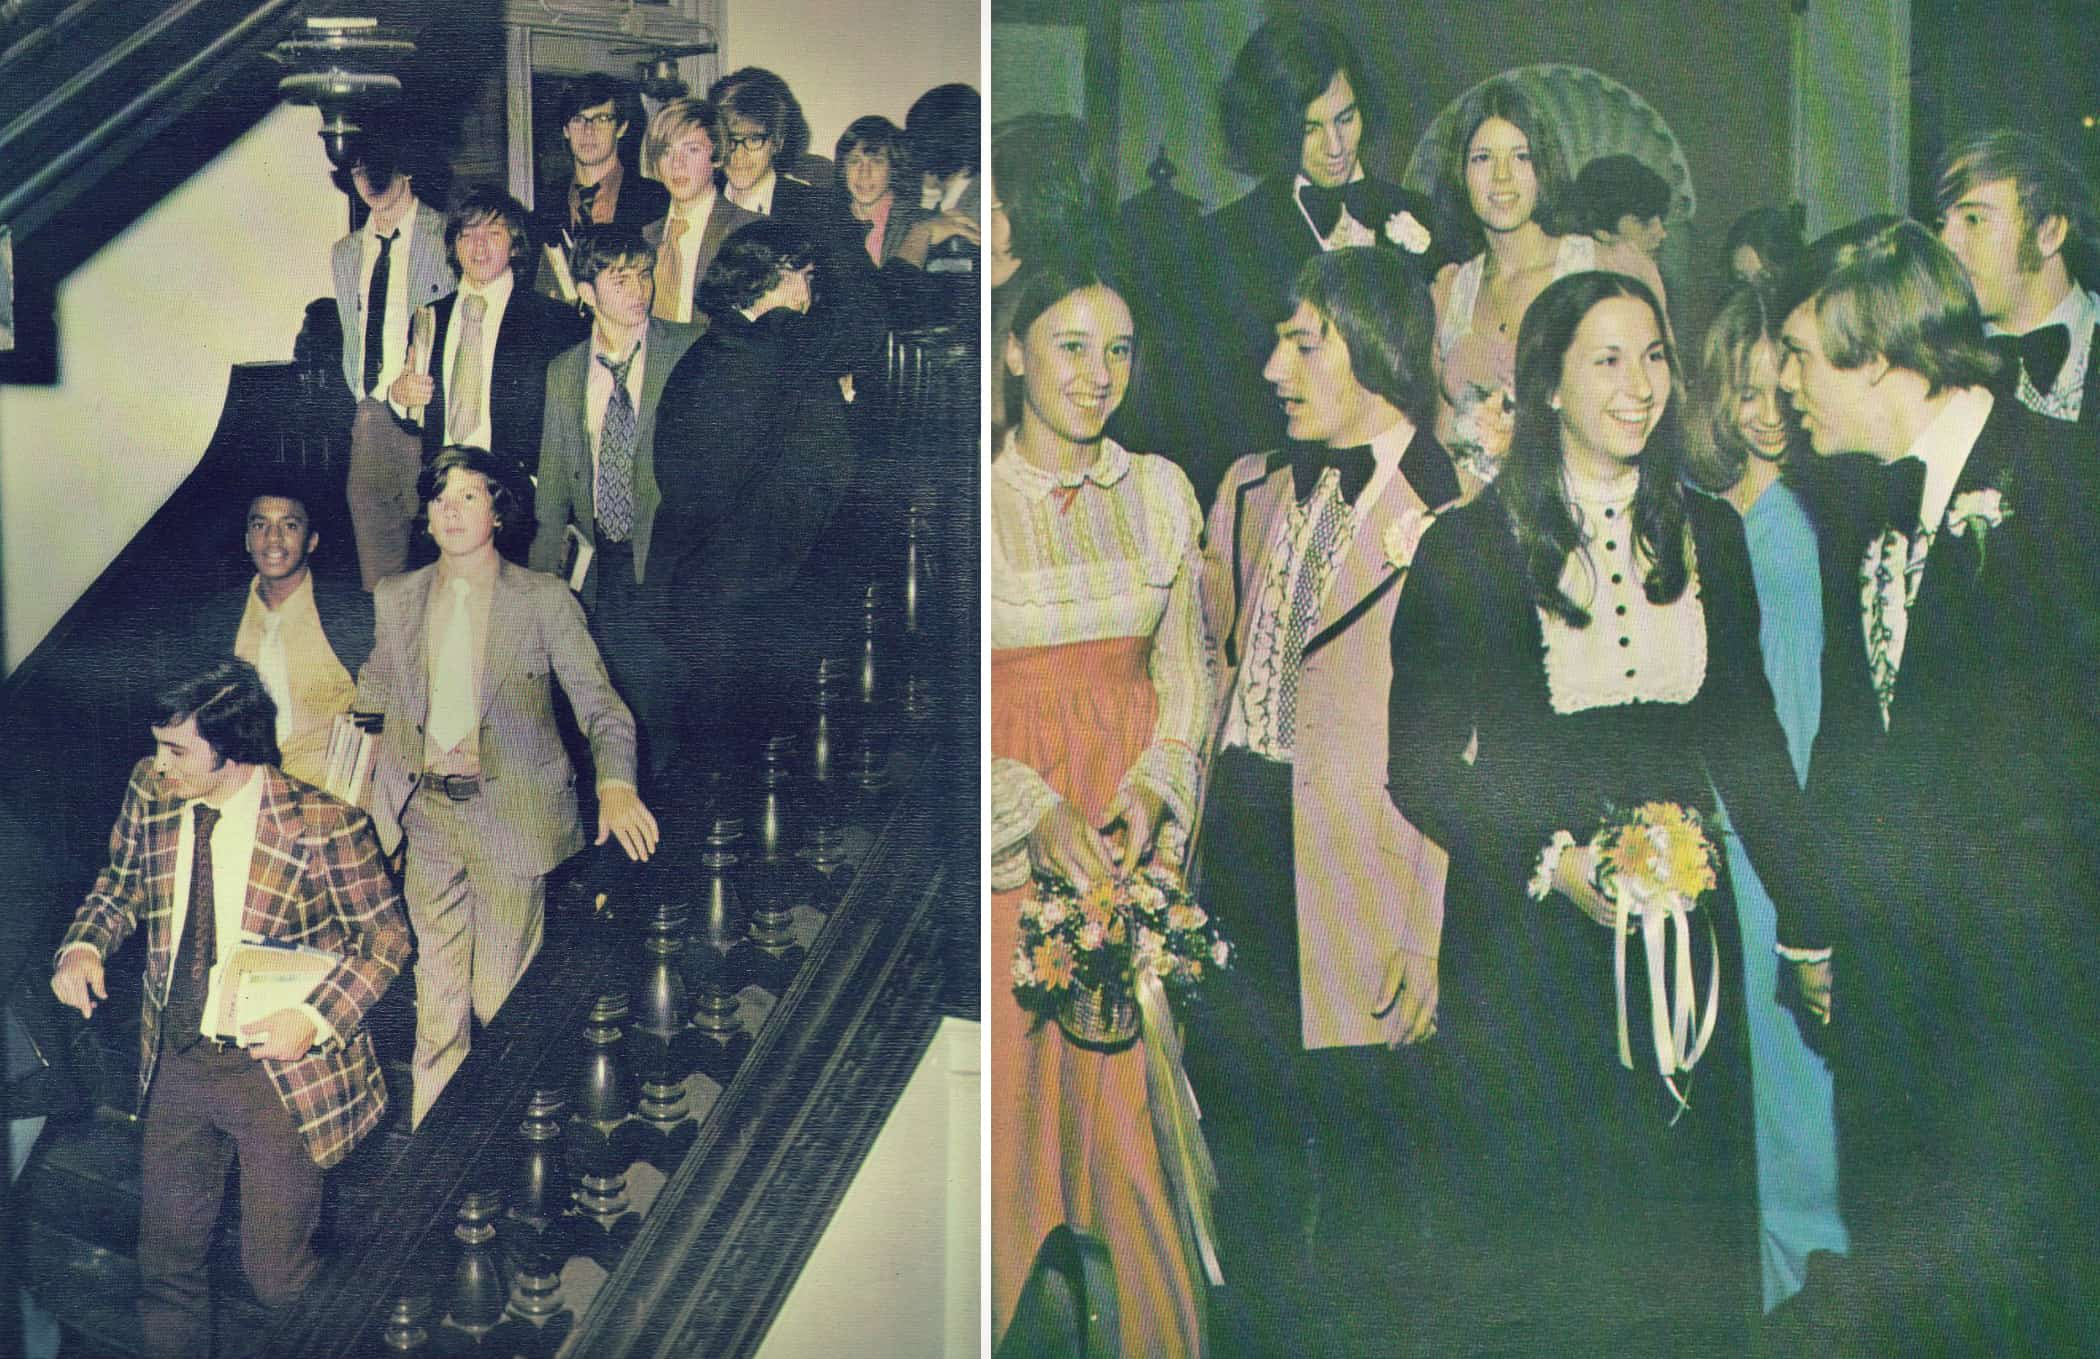 eastfallslocal-70s-collage